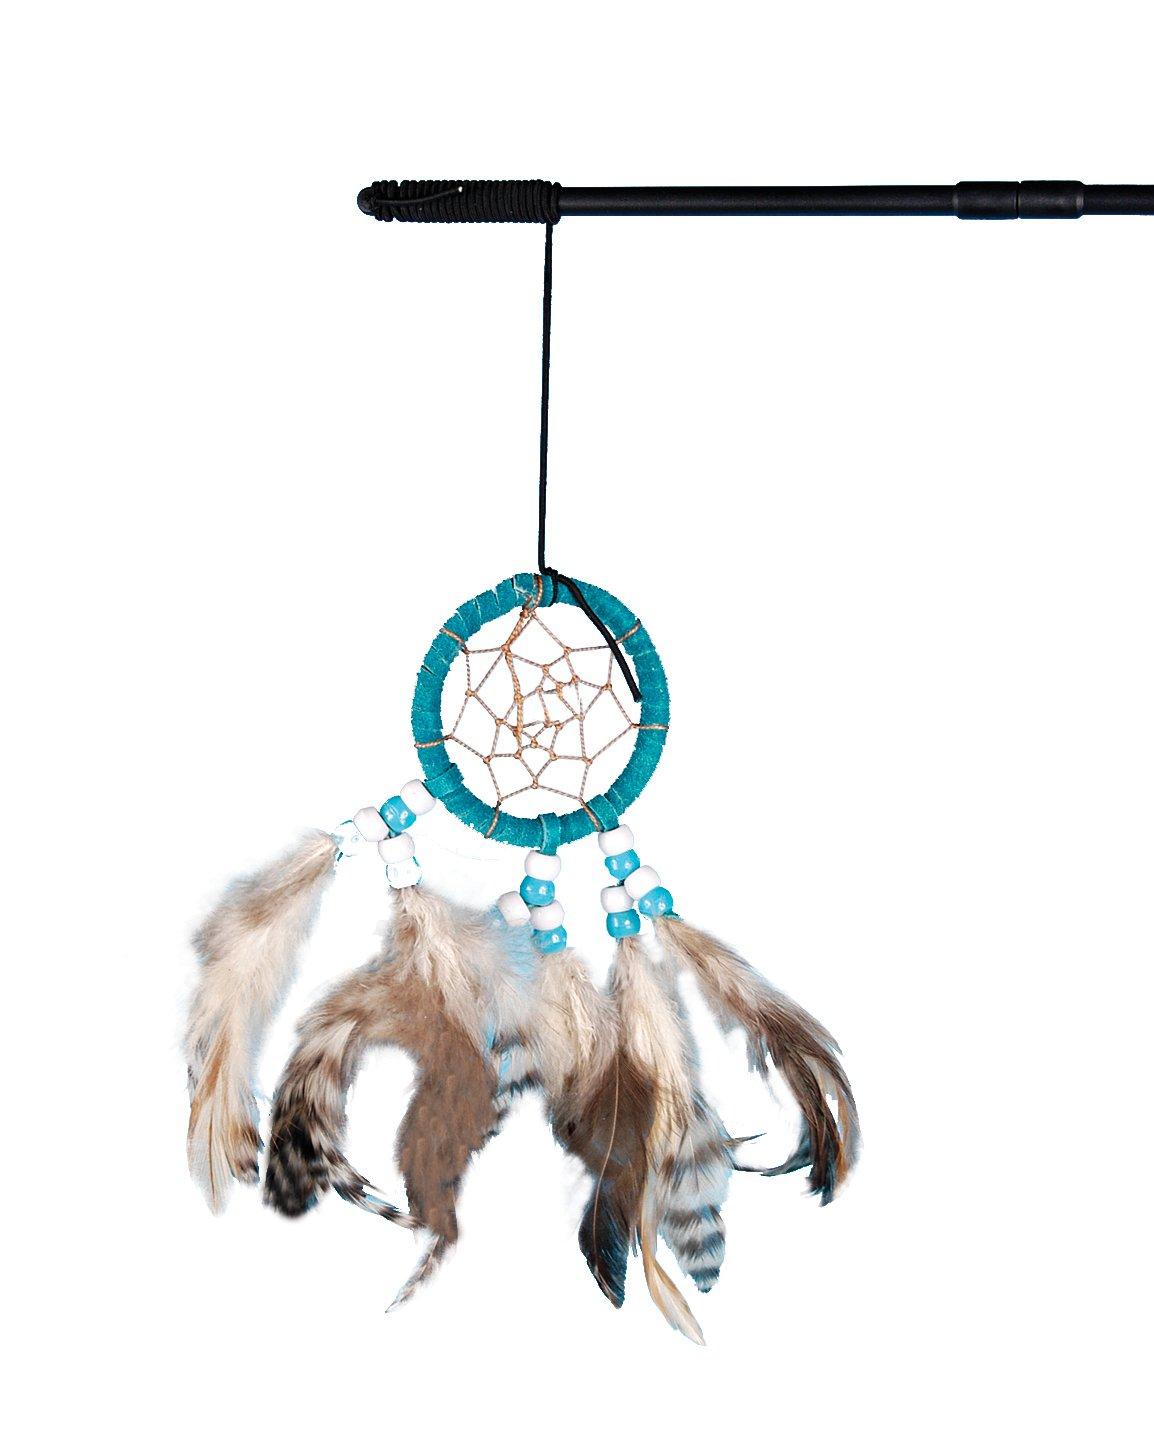 Pennplax Dream Catcher Cat Toy